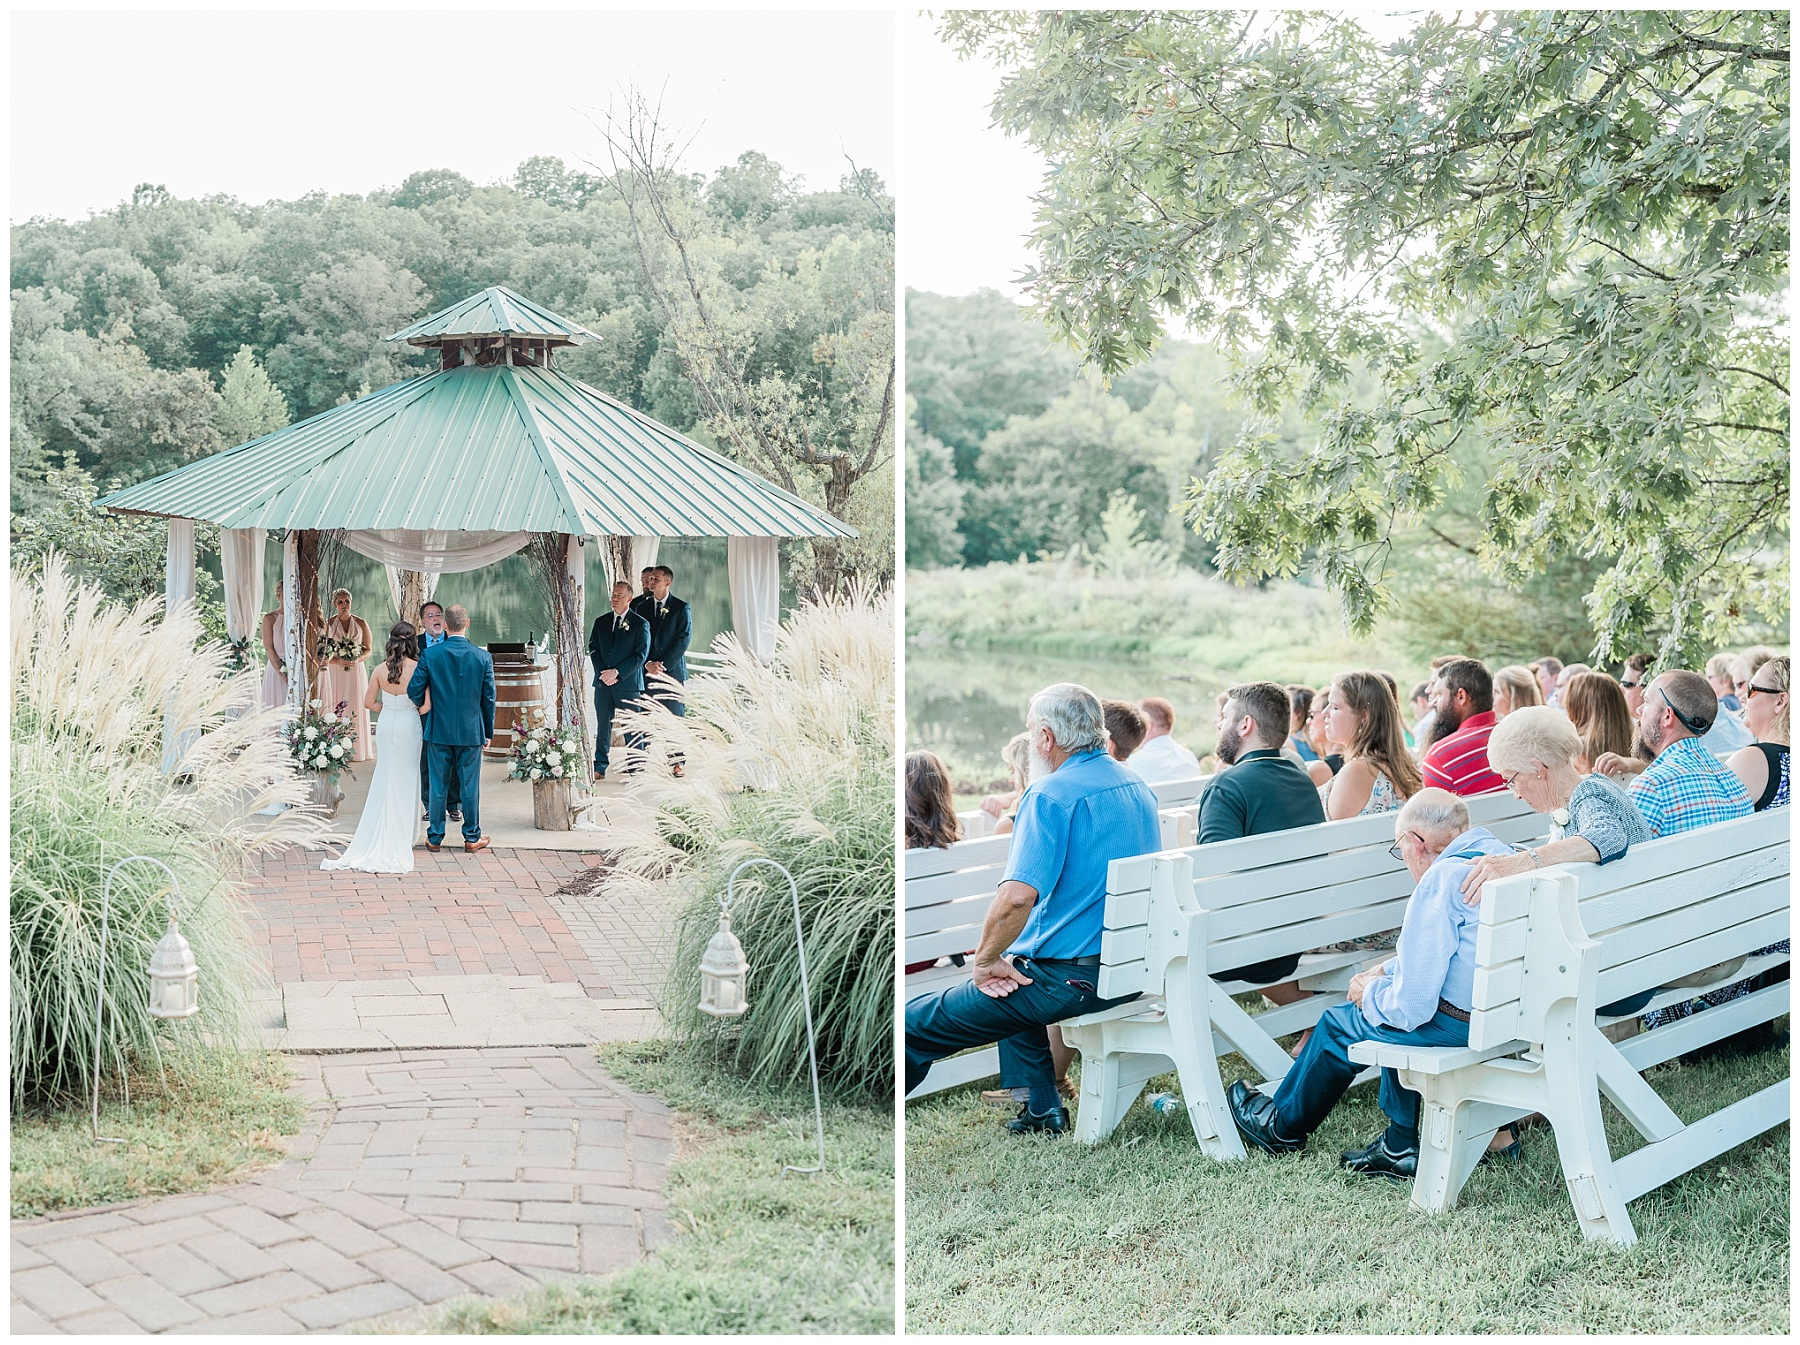 Romantic Summer Sunset Wedding Ceremony at Little Piney Lodge St. Louis Missouri by Kelsi Kliethermes Photography Fine Art Photographer_0056.jpg